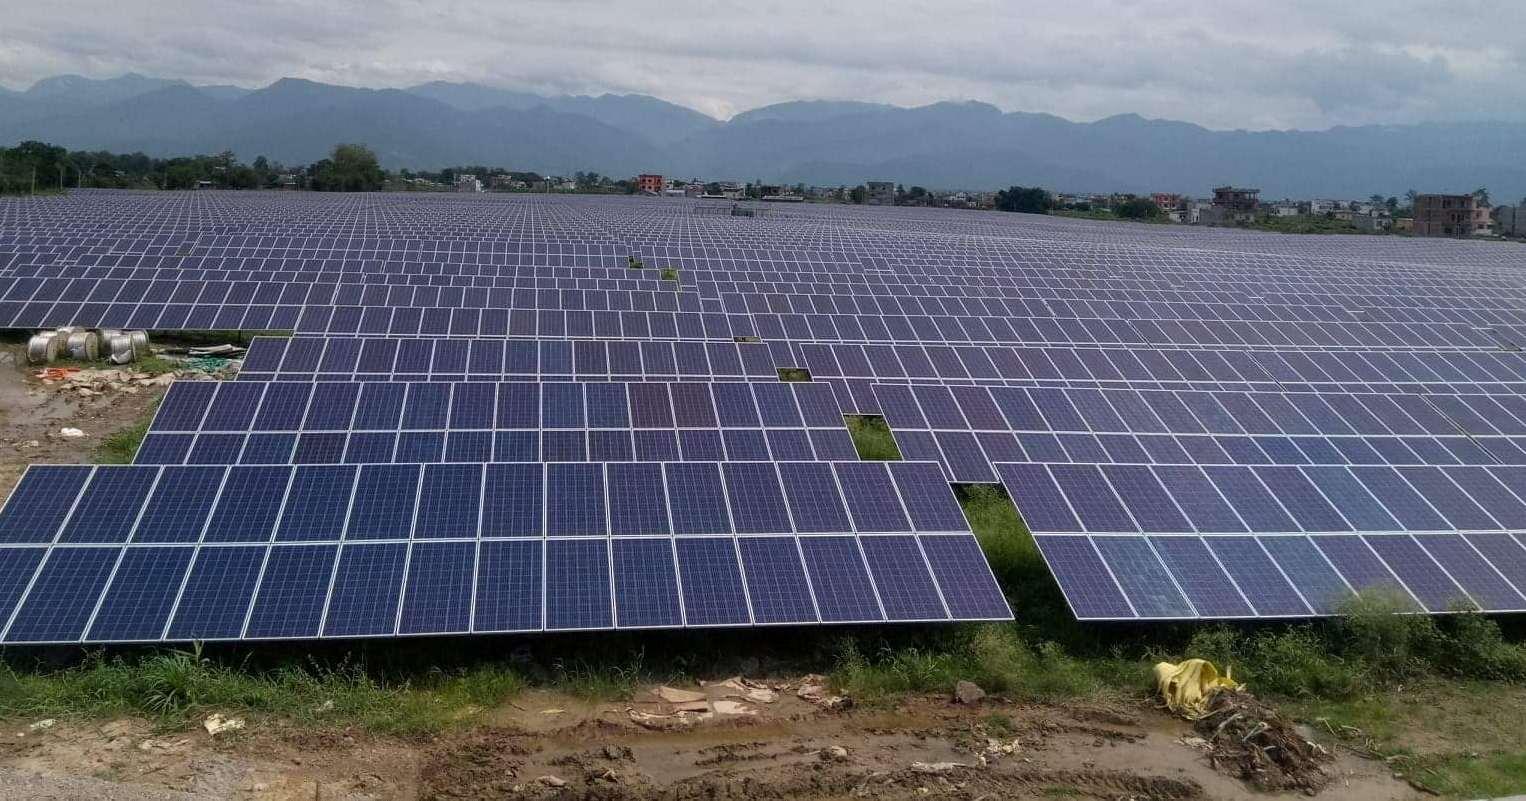 ग्रिड कनेक्टेड सोलार आयोजनाबाट ८.५ मेघावाट बिद्युत उत्पादन सुरु